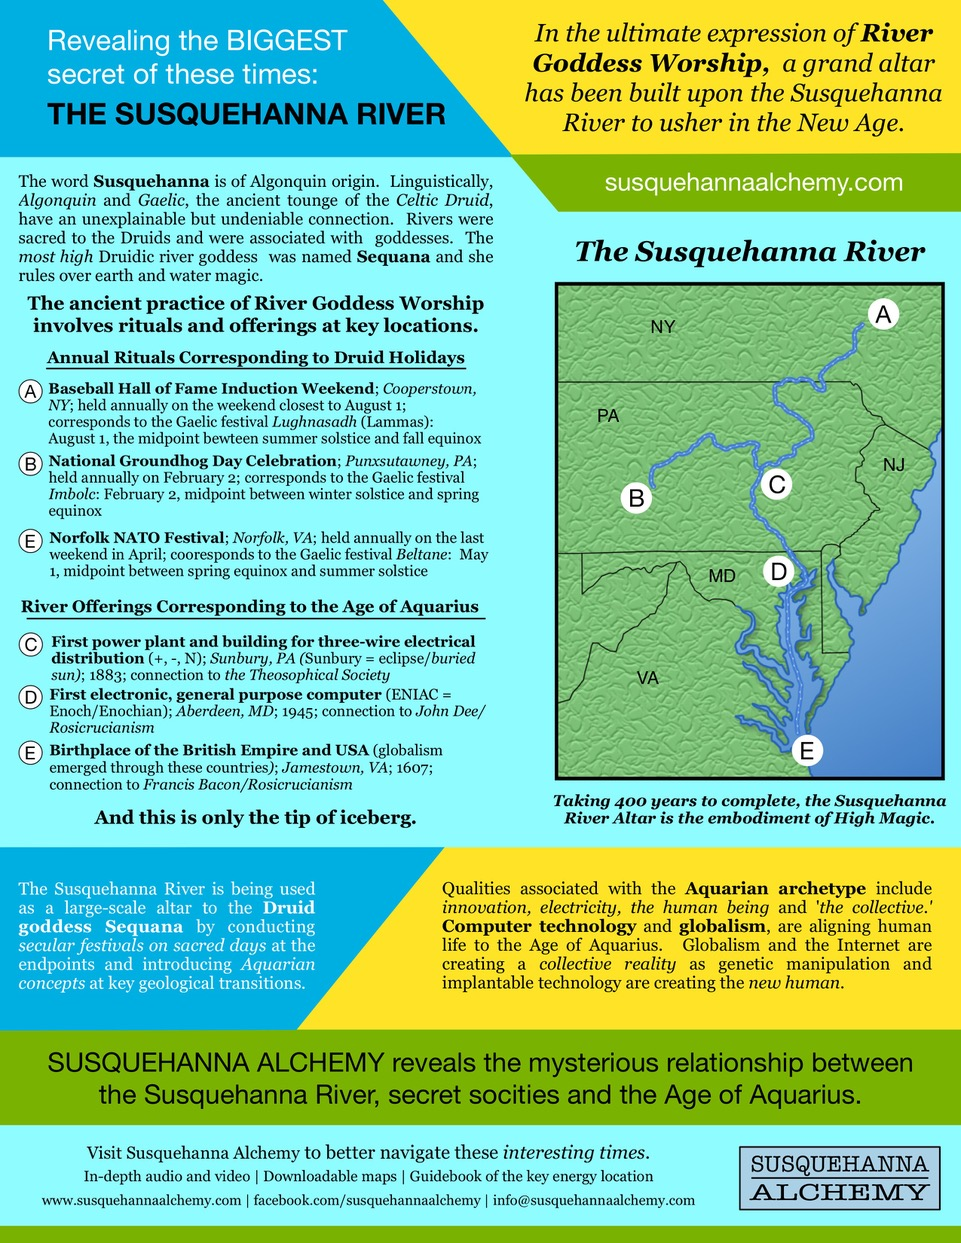 The Susquehanna Mystery — OCCULTURE